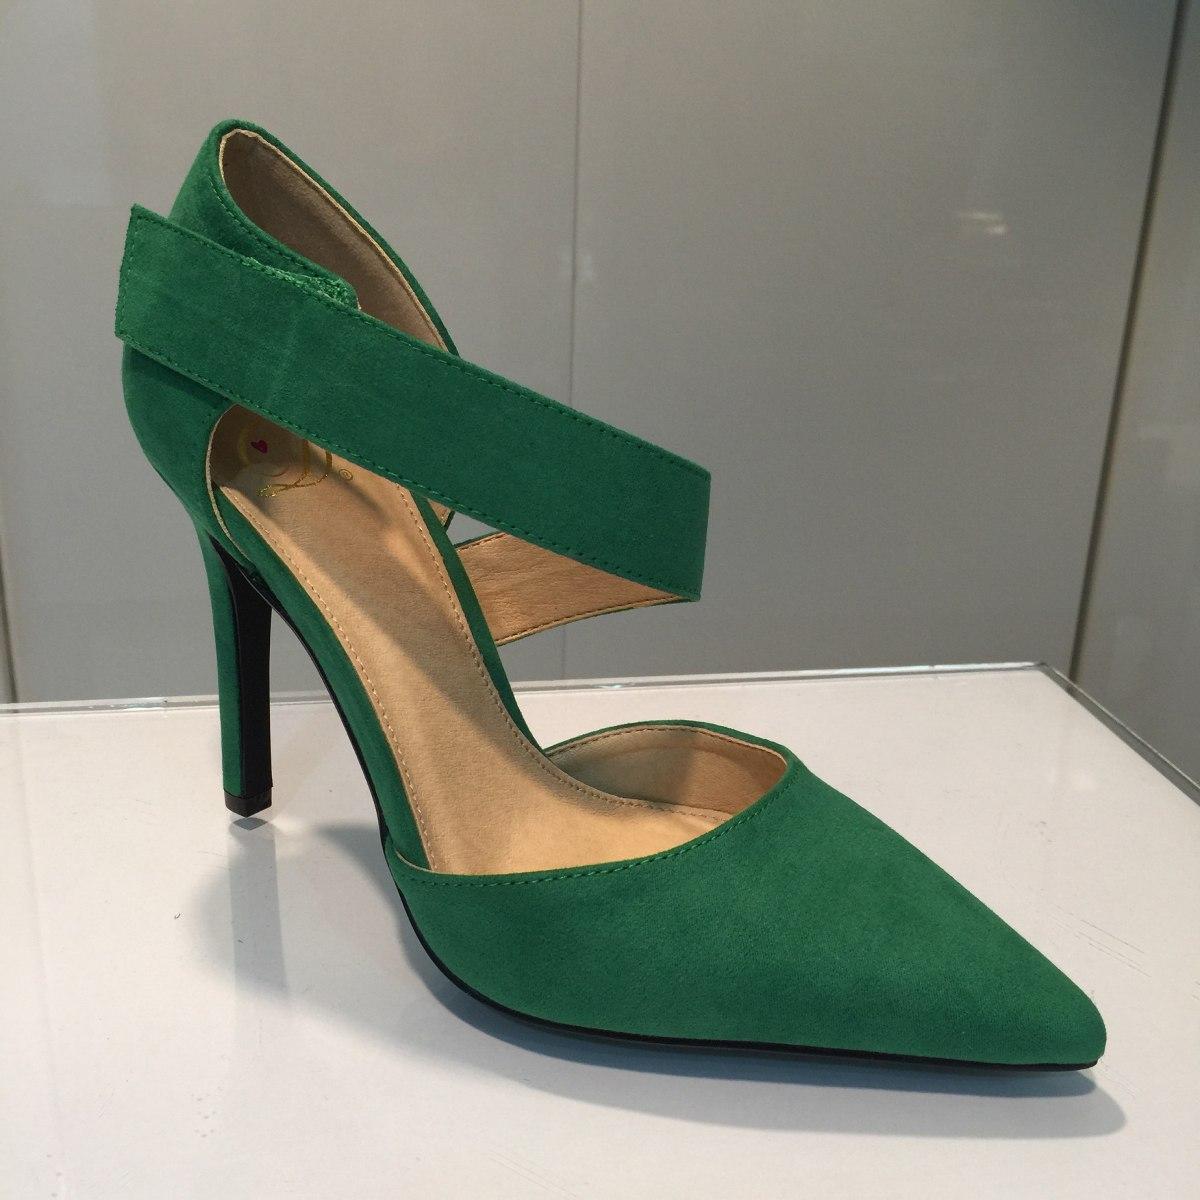 Zapatos verdes para mujer ilK7vao